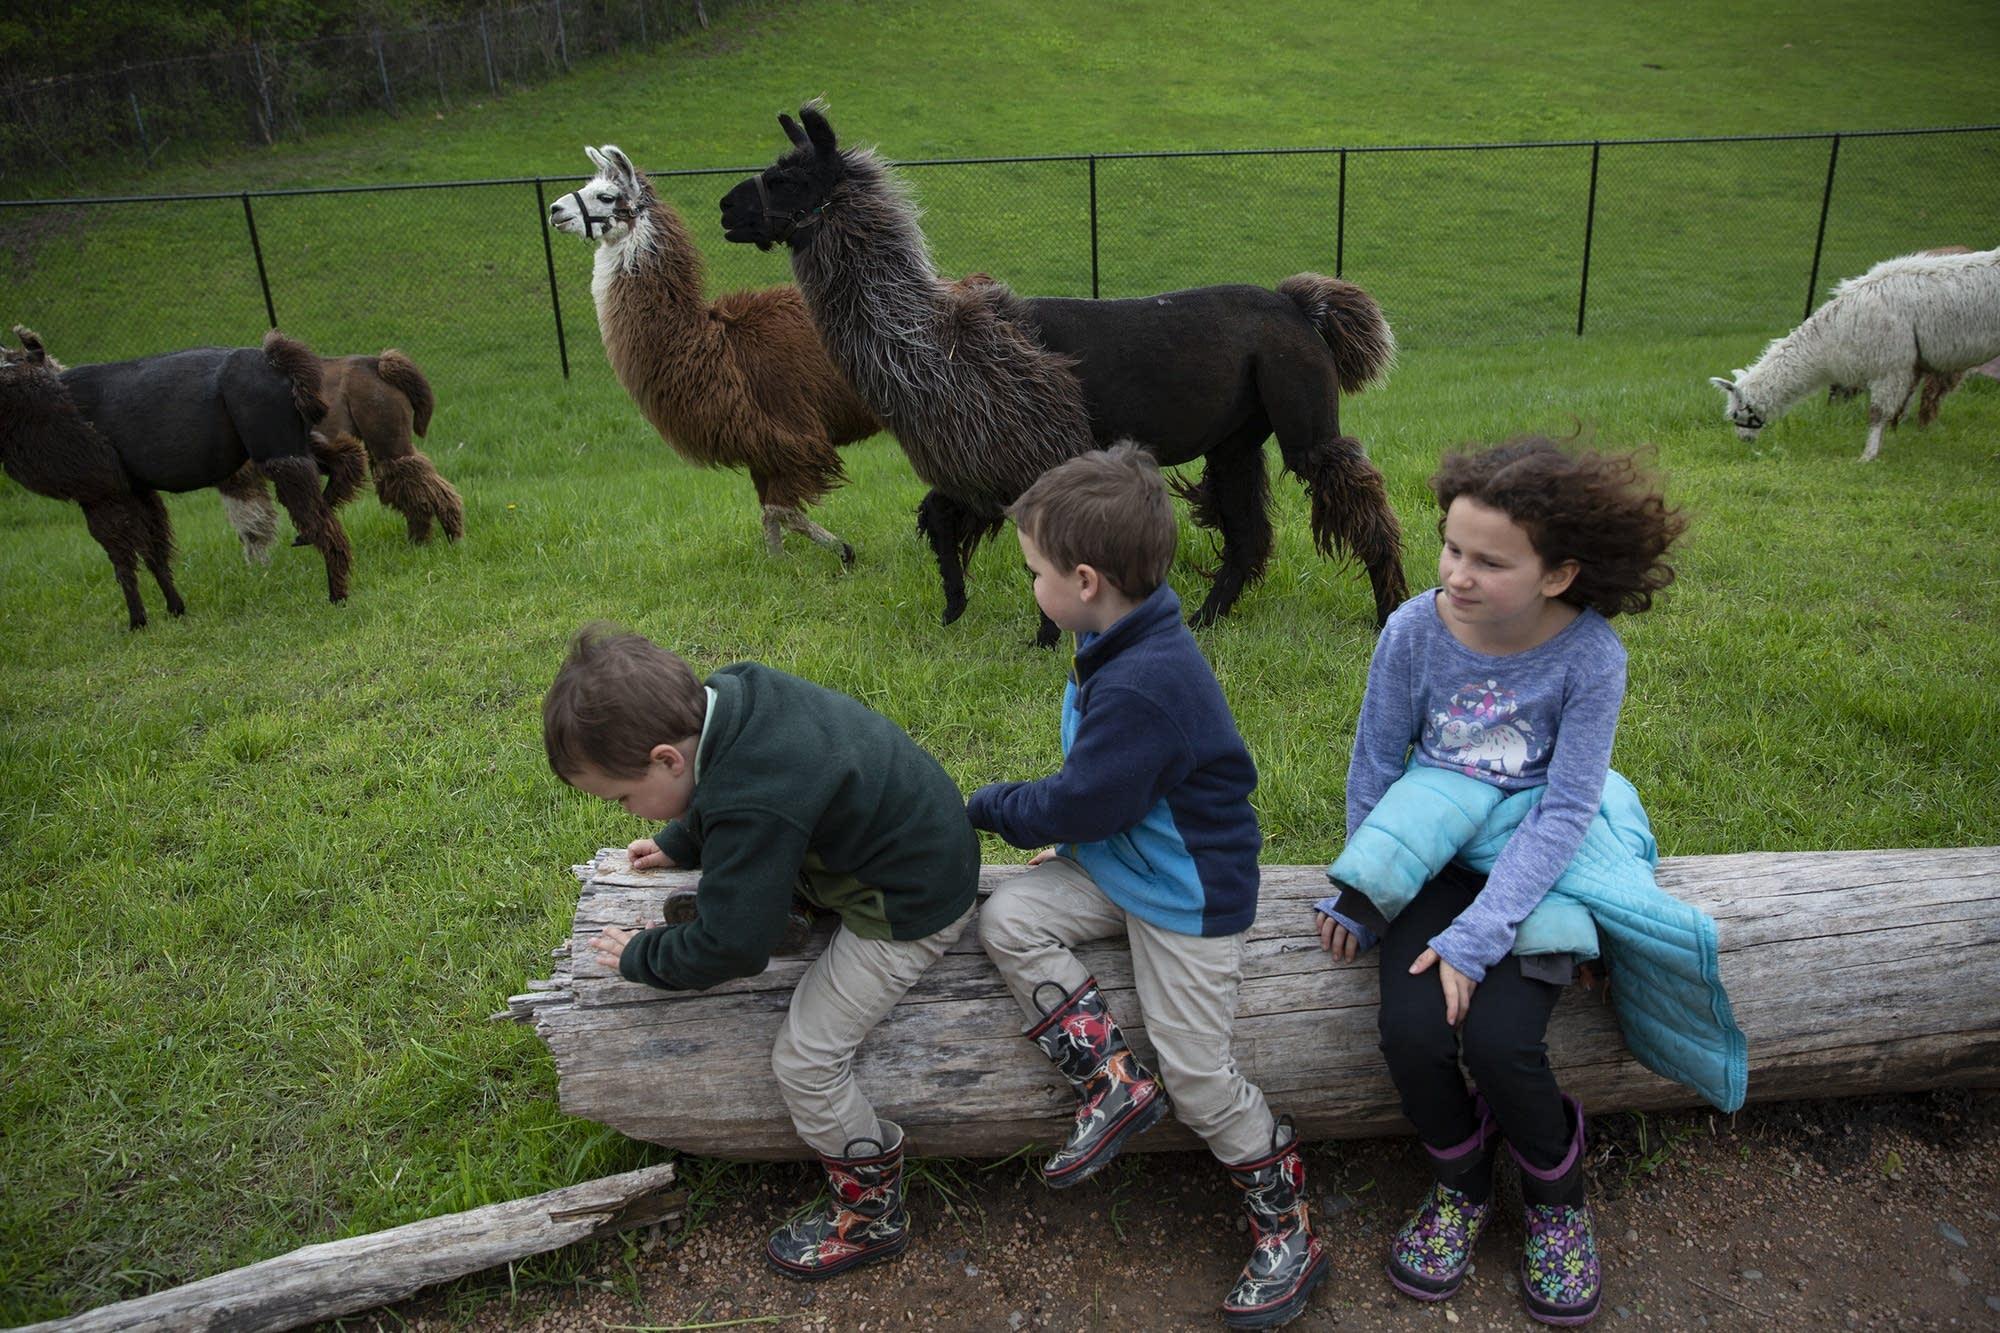 Jude and Jameson Larsen, 4, and their sister Amelia, 9, watch llamas roam.